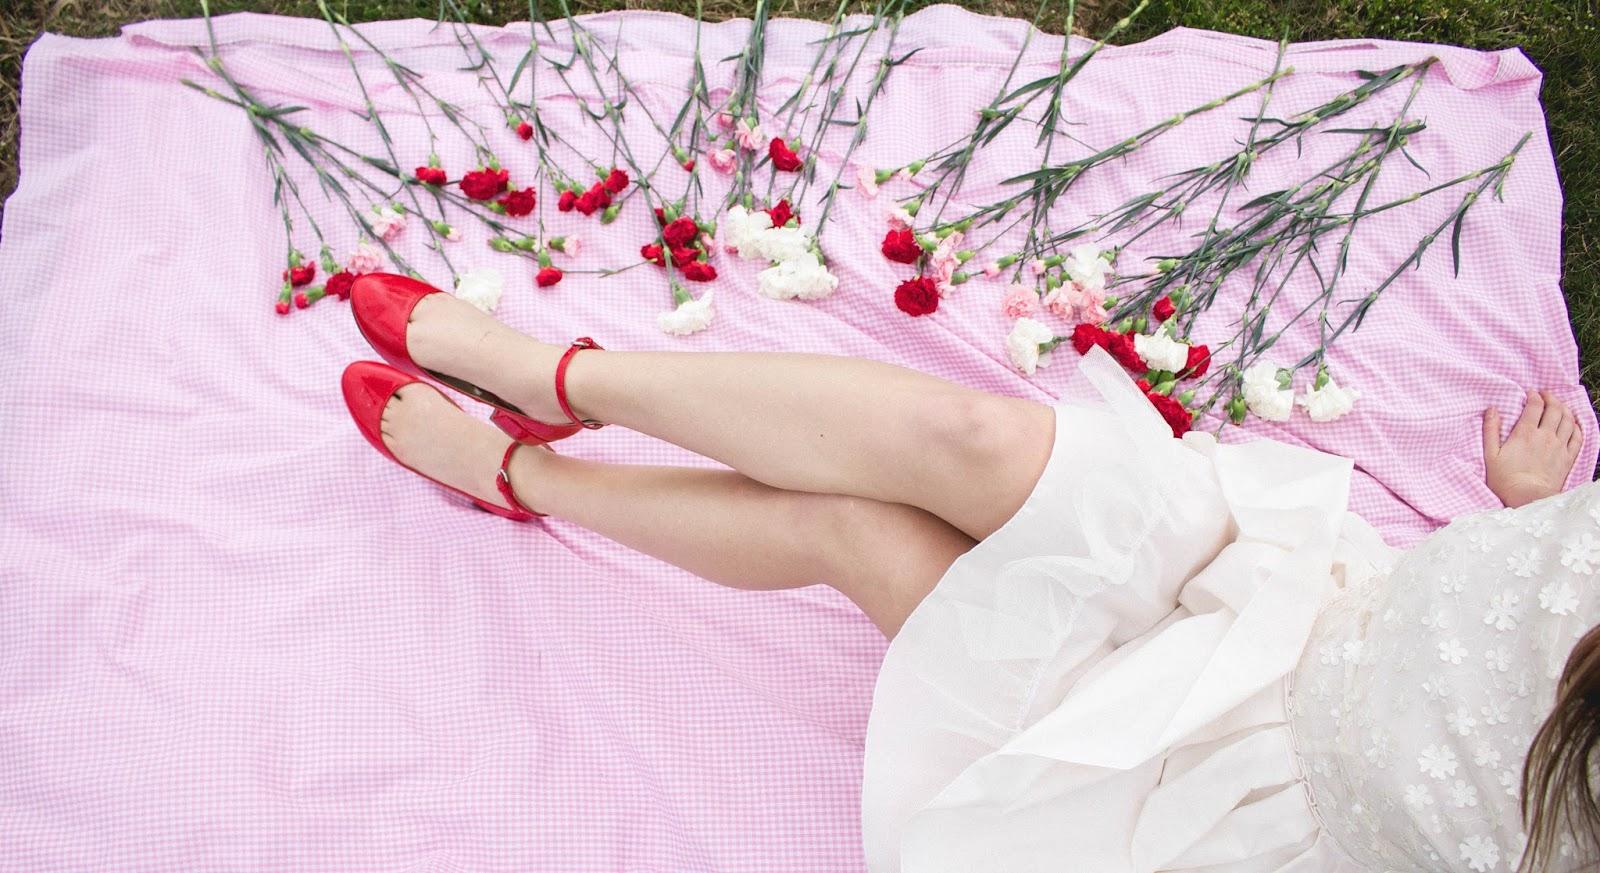 style, vintage, retro, vintage inspired, retro inspired, jones and jones, jones + jones, white short formal dress, white mini dress, floral white dress, audrey hepburn style, taylor swift style, ariana grande style, lolita, american beauty style, screenwriting, feminism, women in film, fashion blogger, film blogger, vintage style, tulle skirt dress, pleated skirt dress, 60's style, classic style, classic hollywood, girly, girly fashion,